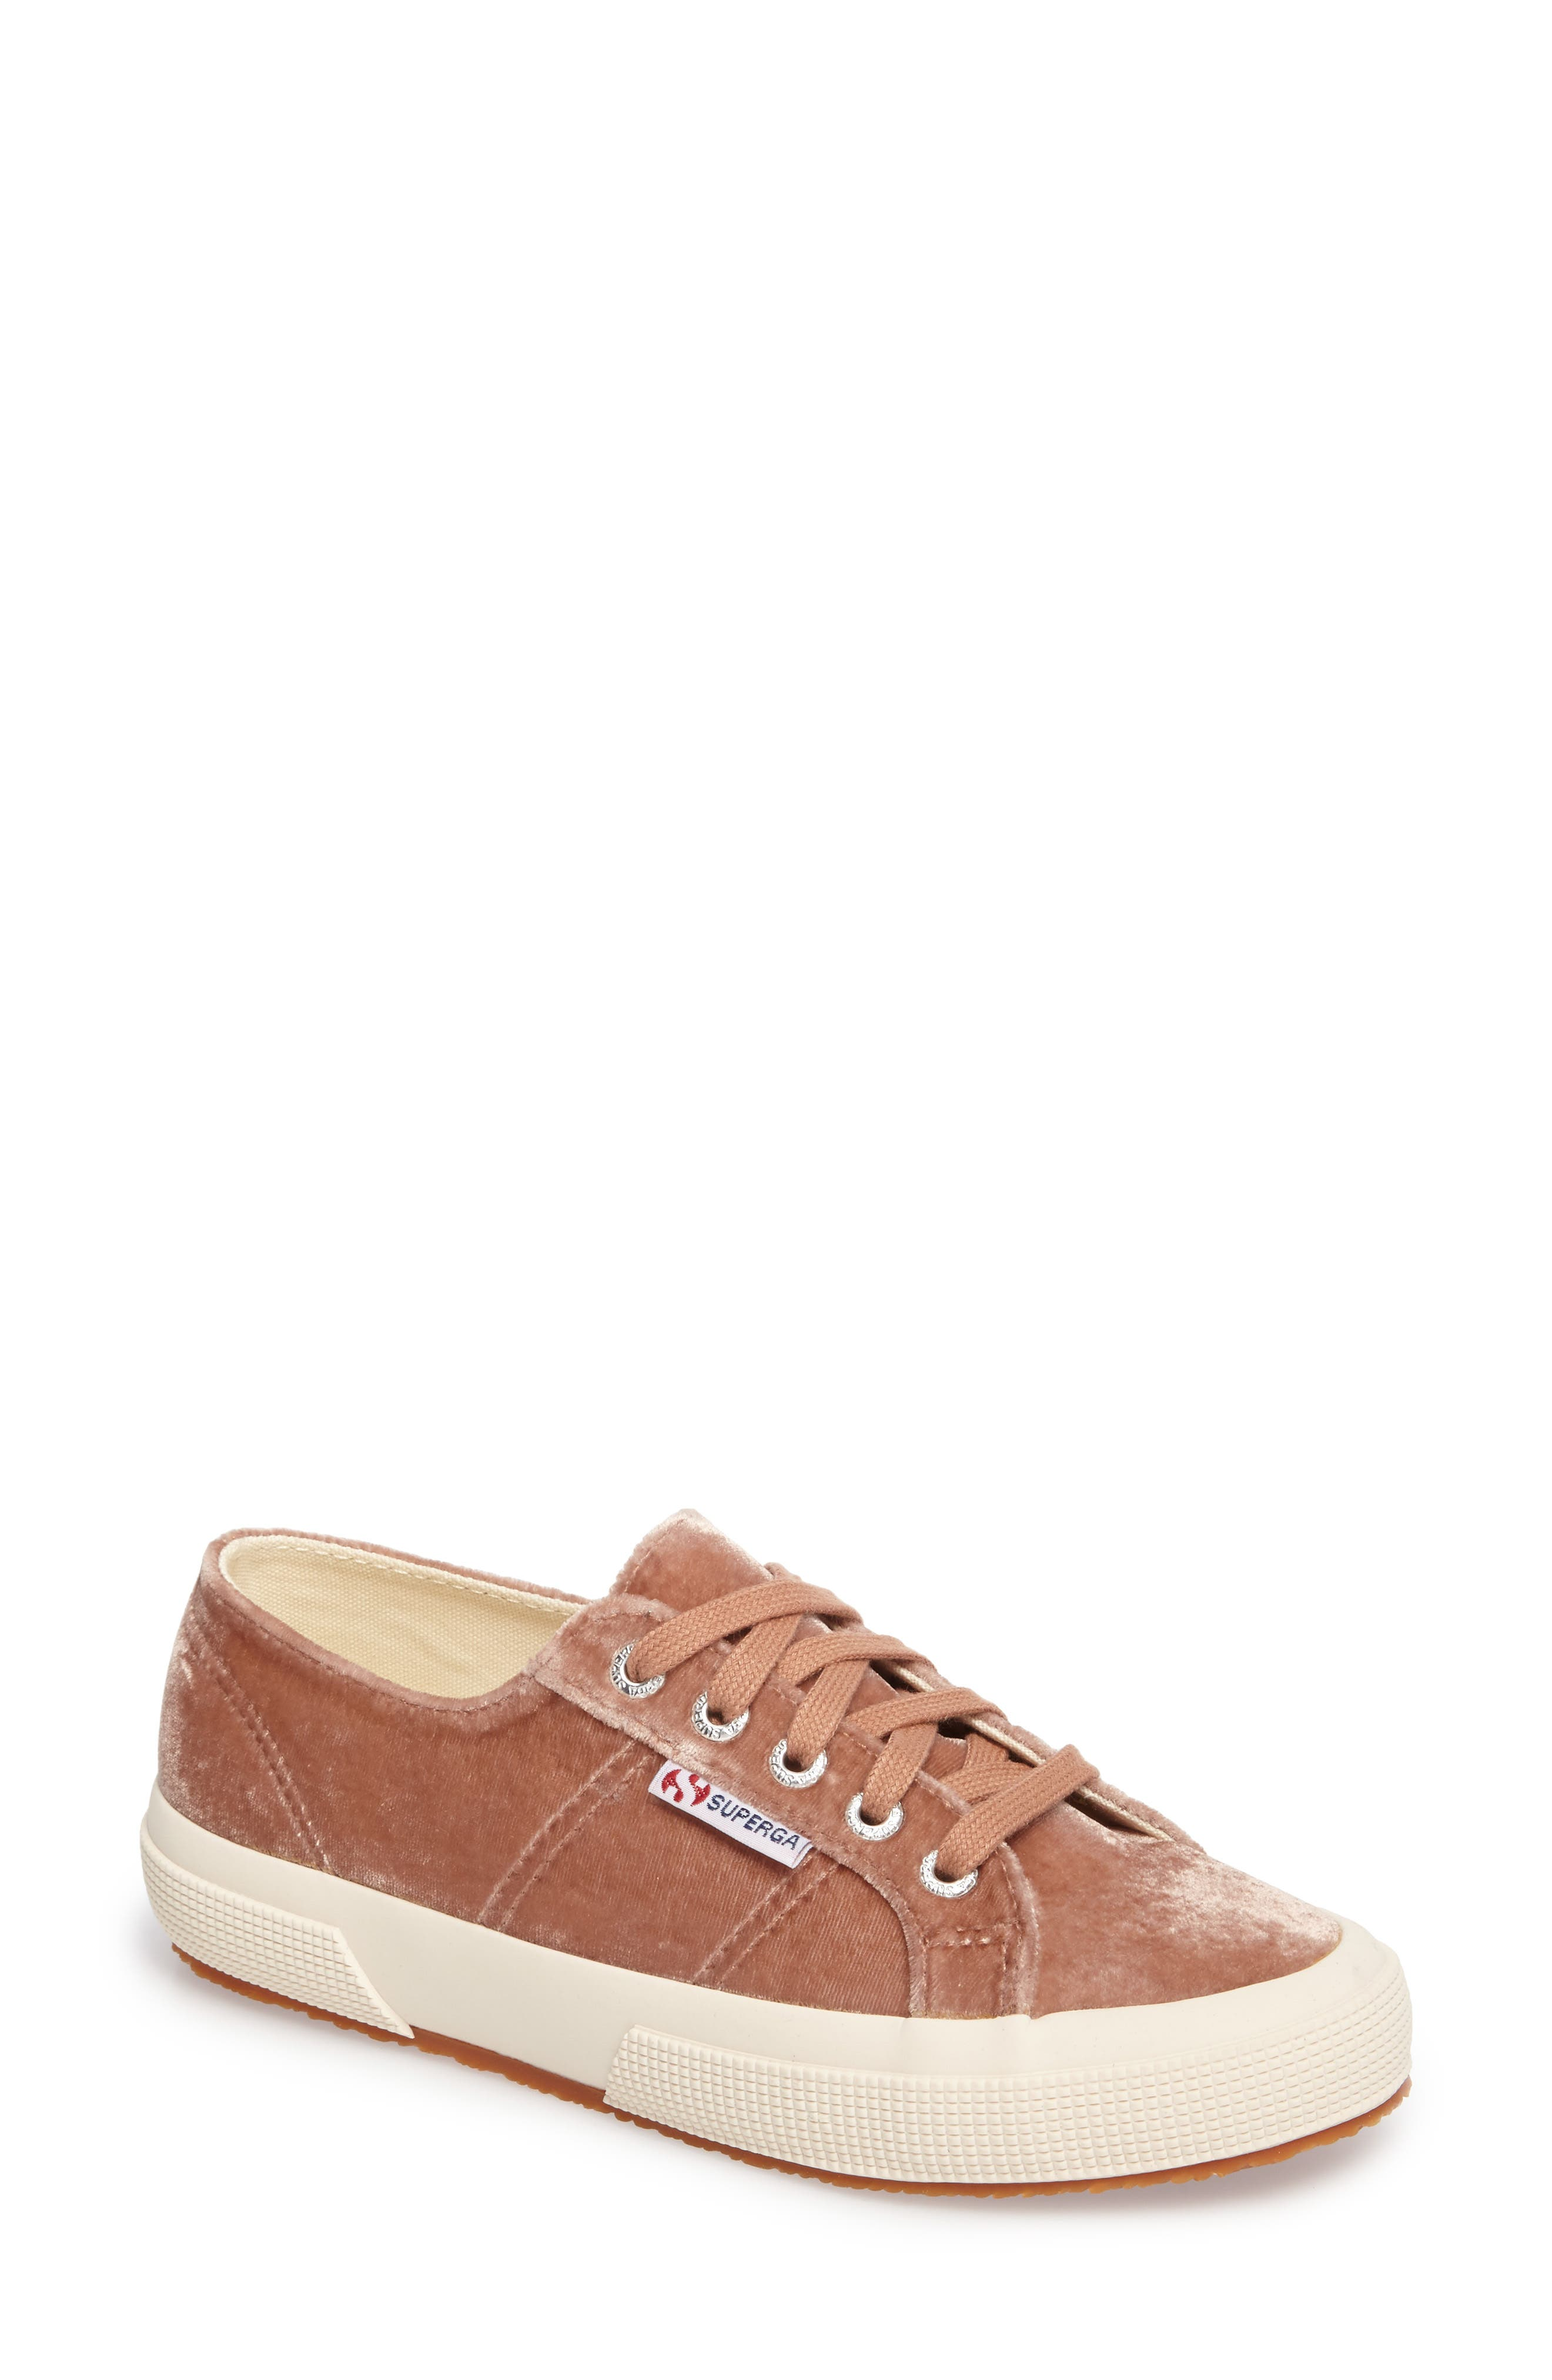 Main Image - Superga Cotu Classic Sneaker